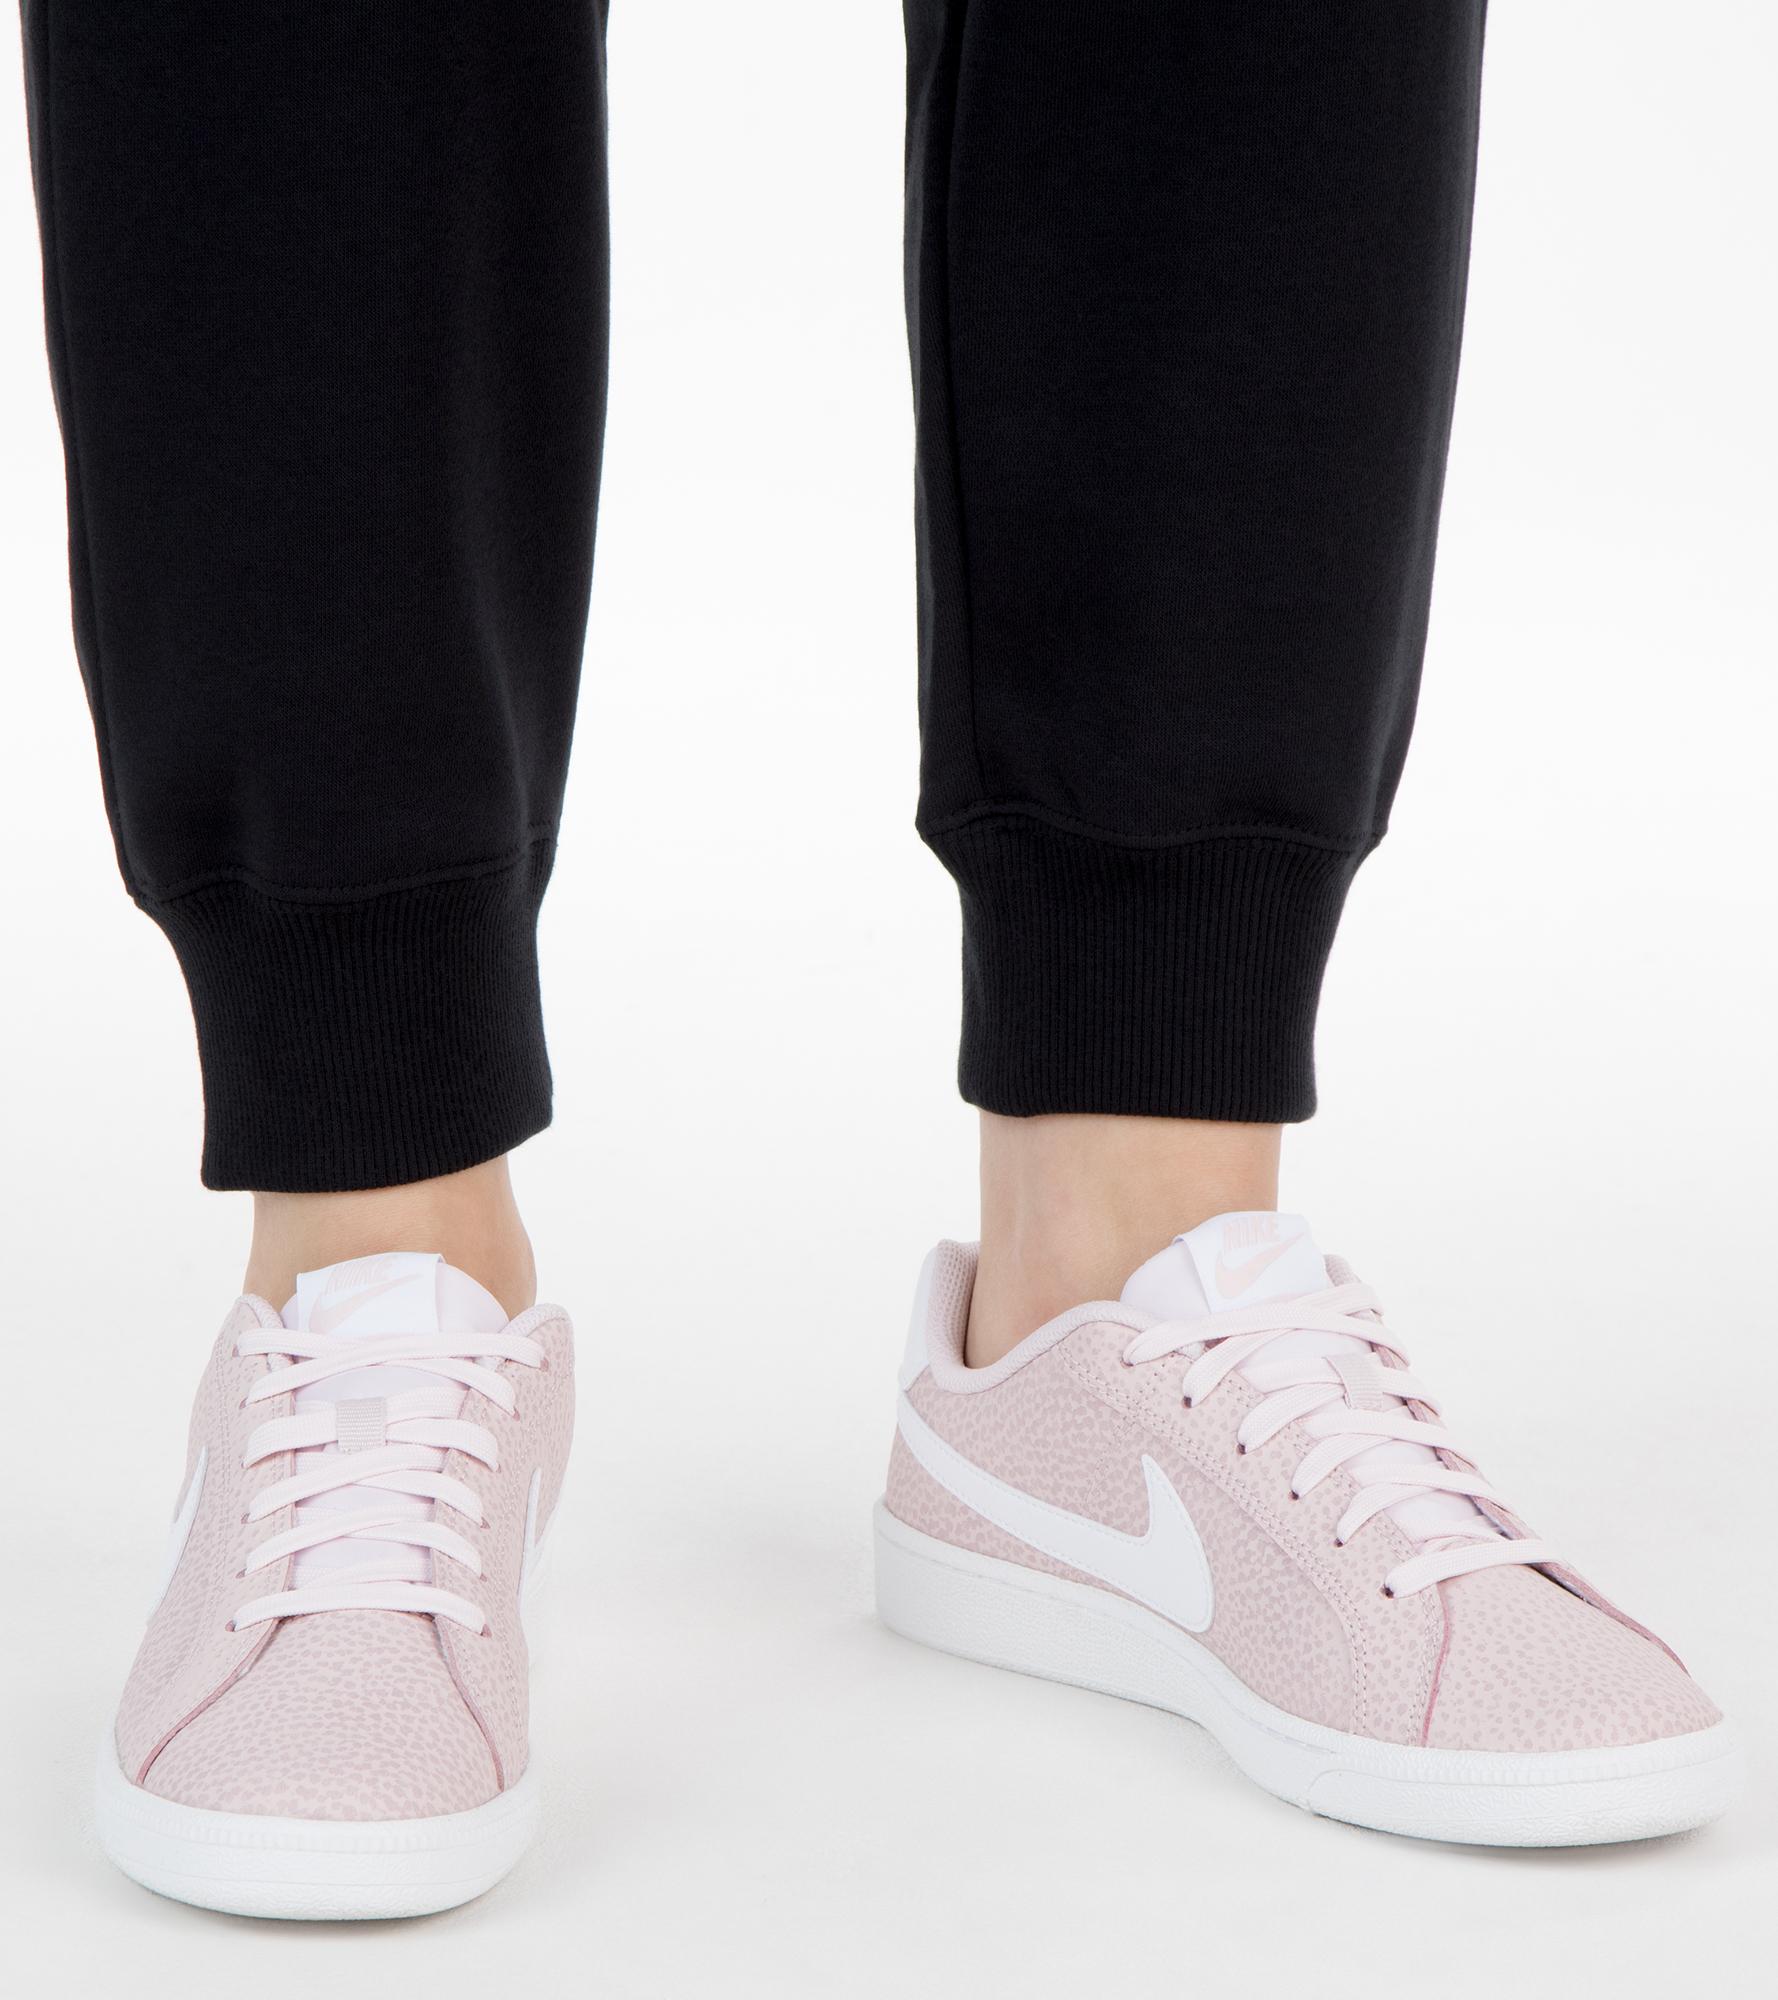 цена Nike Кеды женские Nike Court Royale Premium, размер 37 онлайн в 2017 году